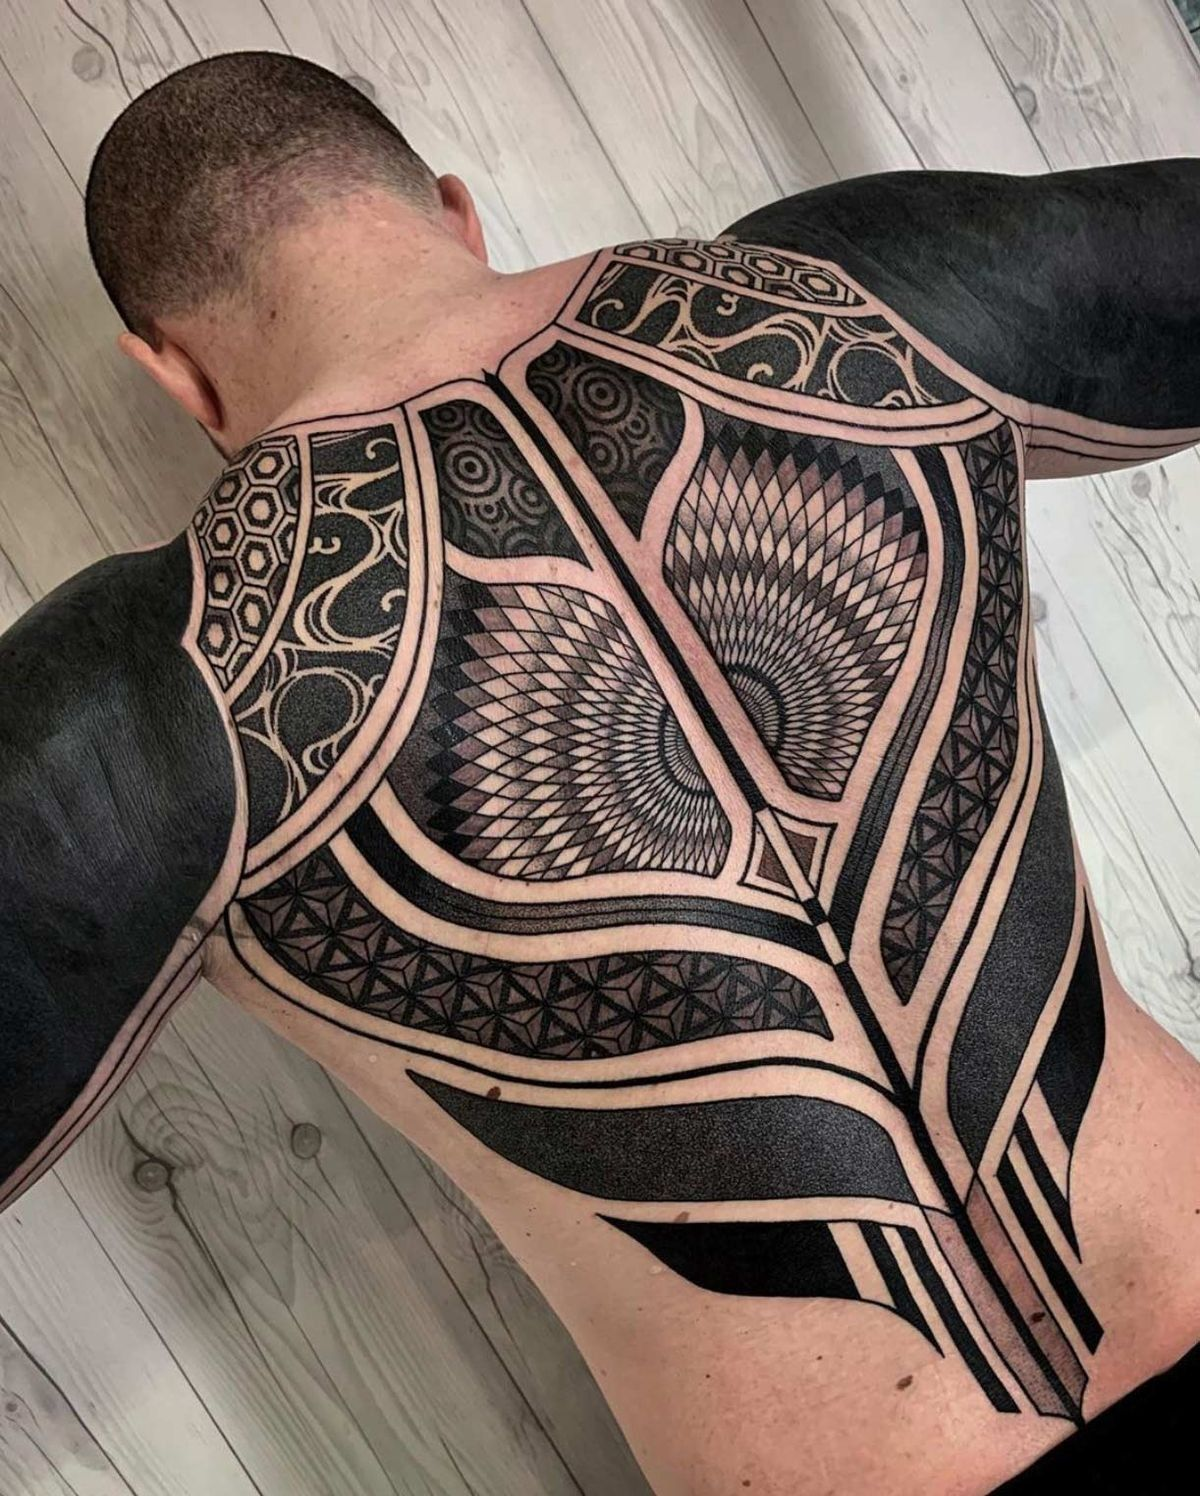 Pin De Jmoto En Tattoos Men Tatuajes Tribal Hombre Tatuajes Geométricos Hombre Tatuajes En La Espalda